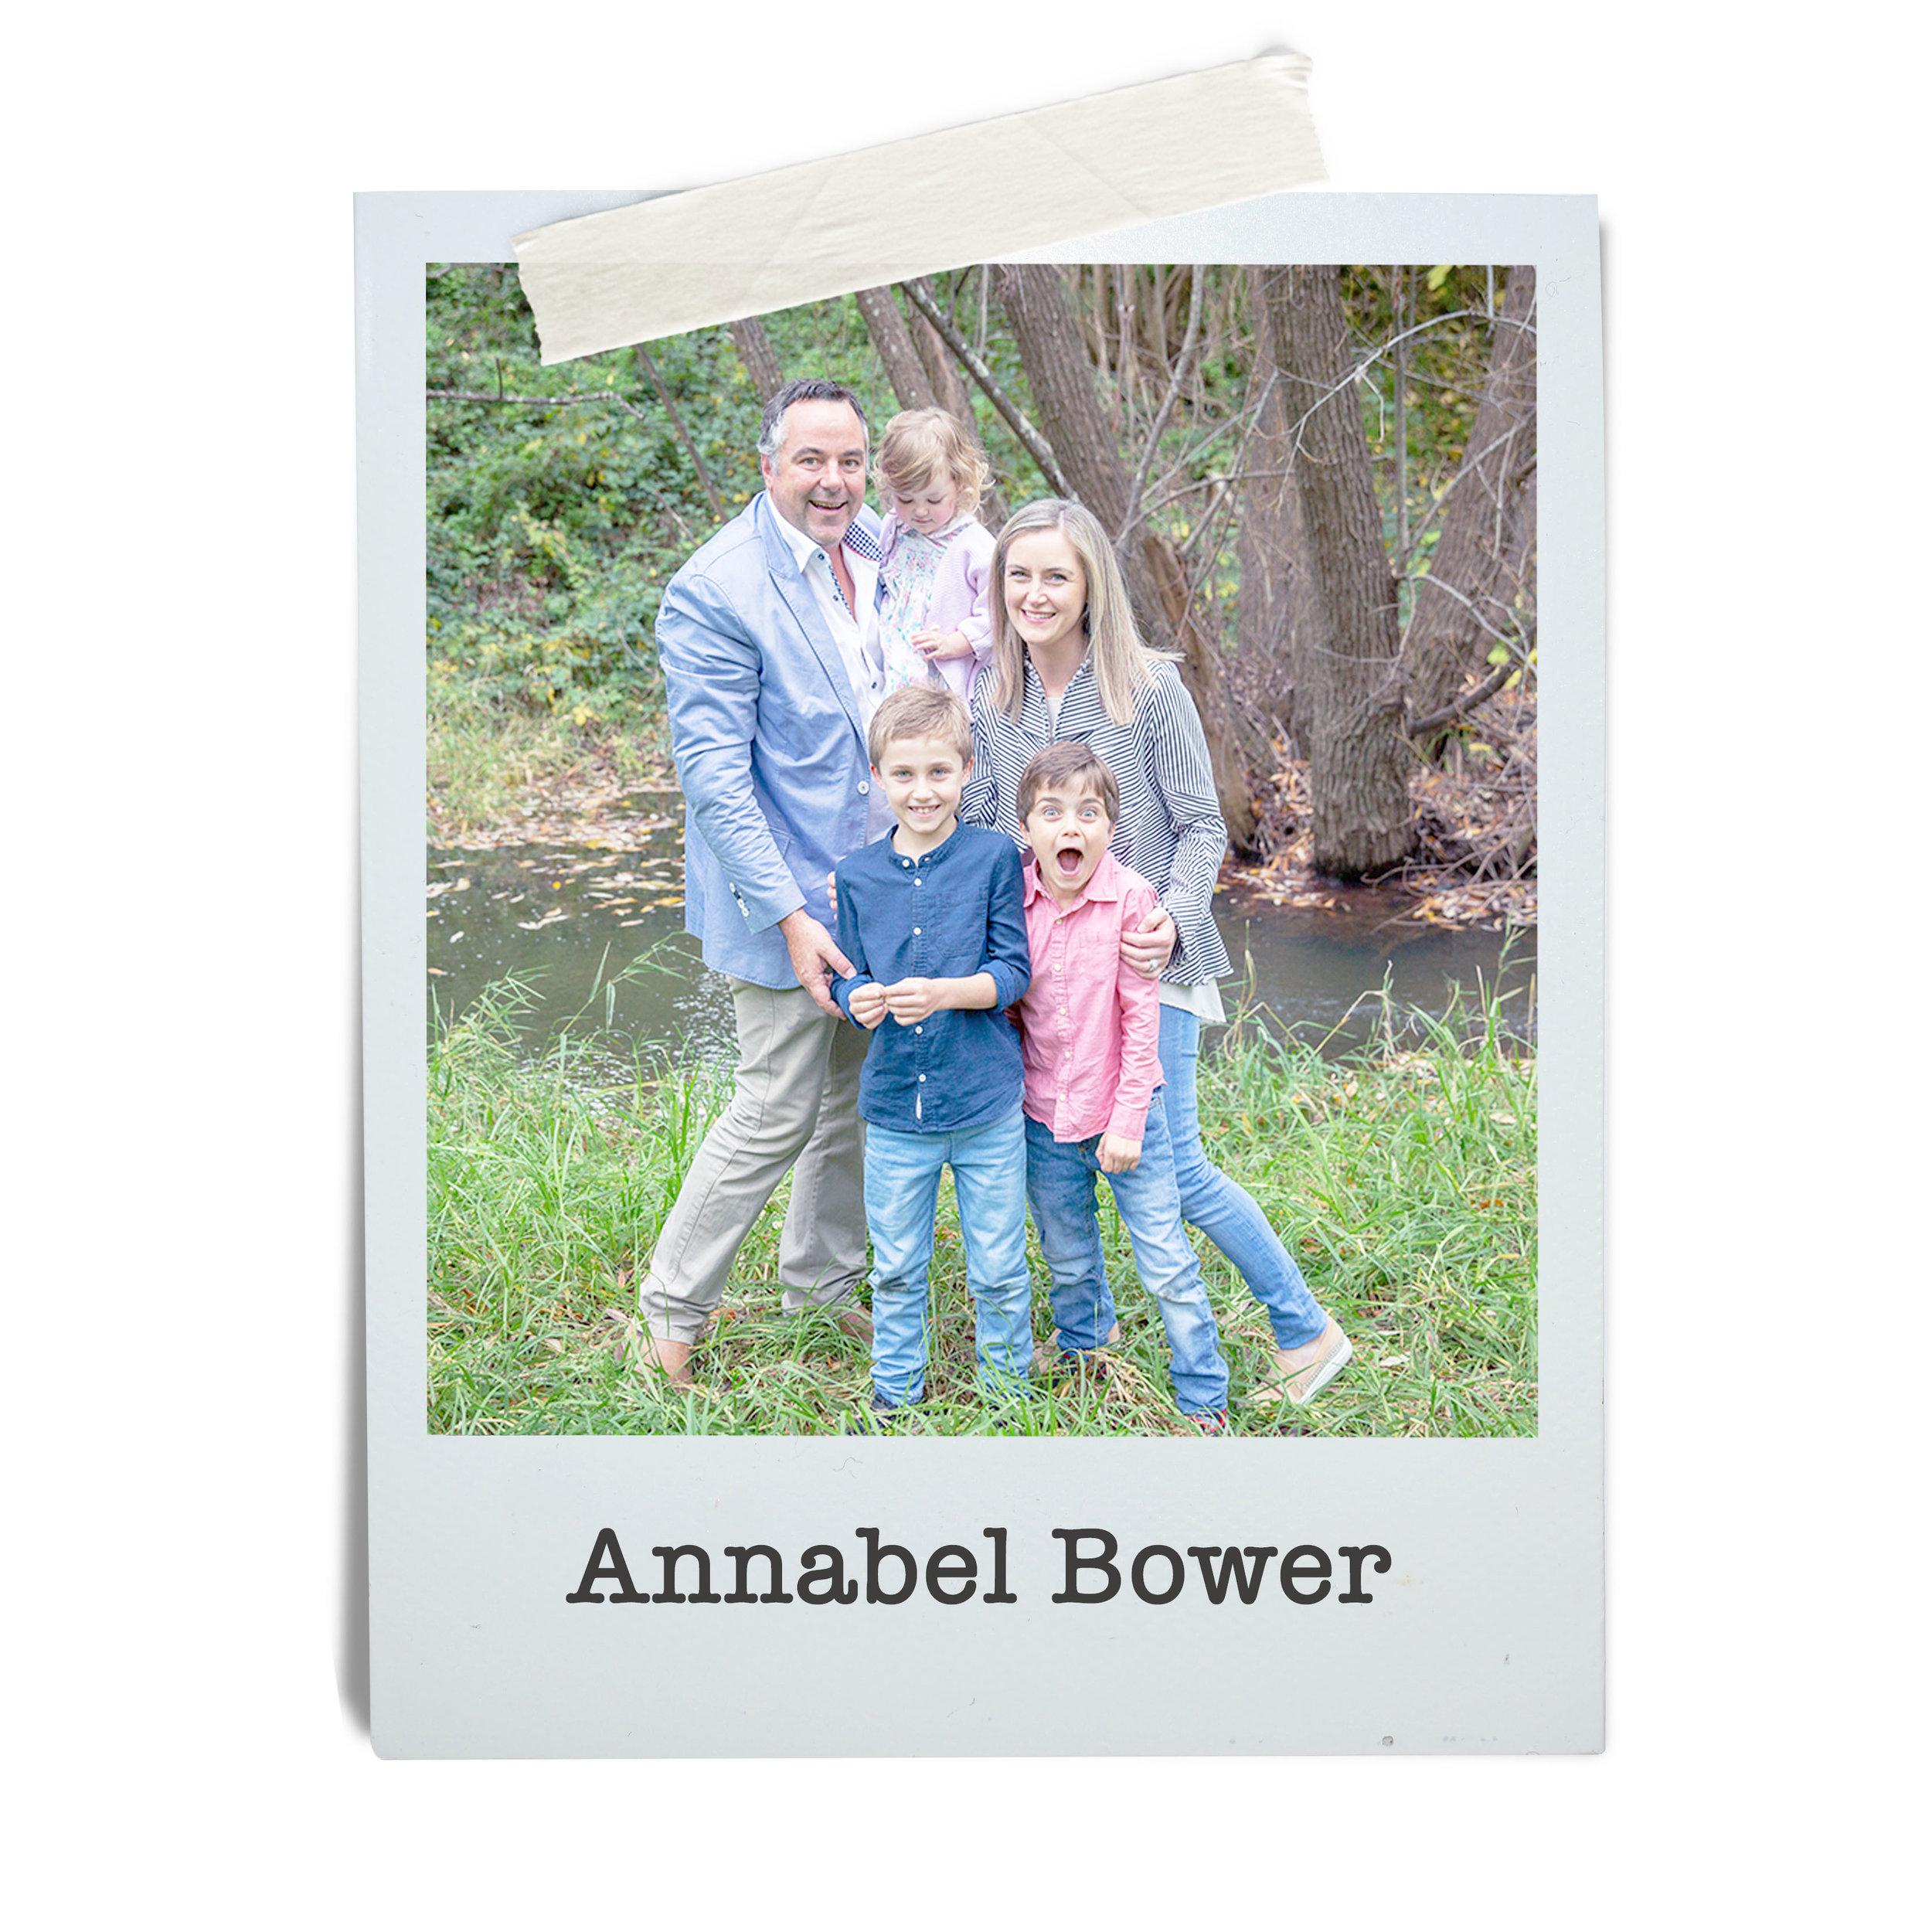 Annabel Bower